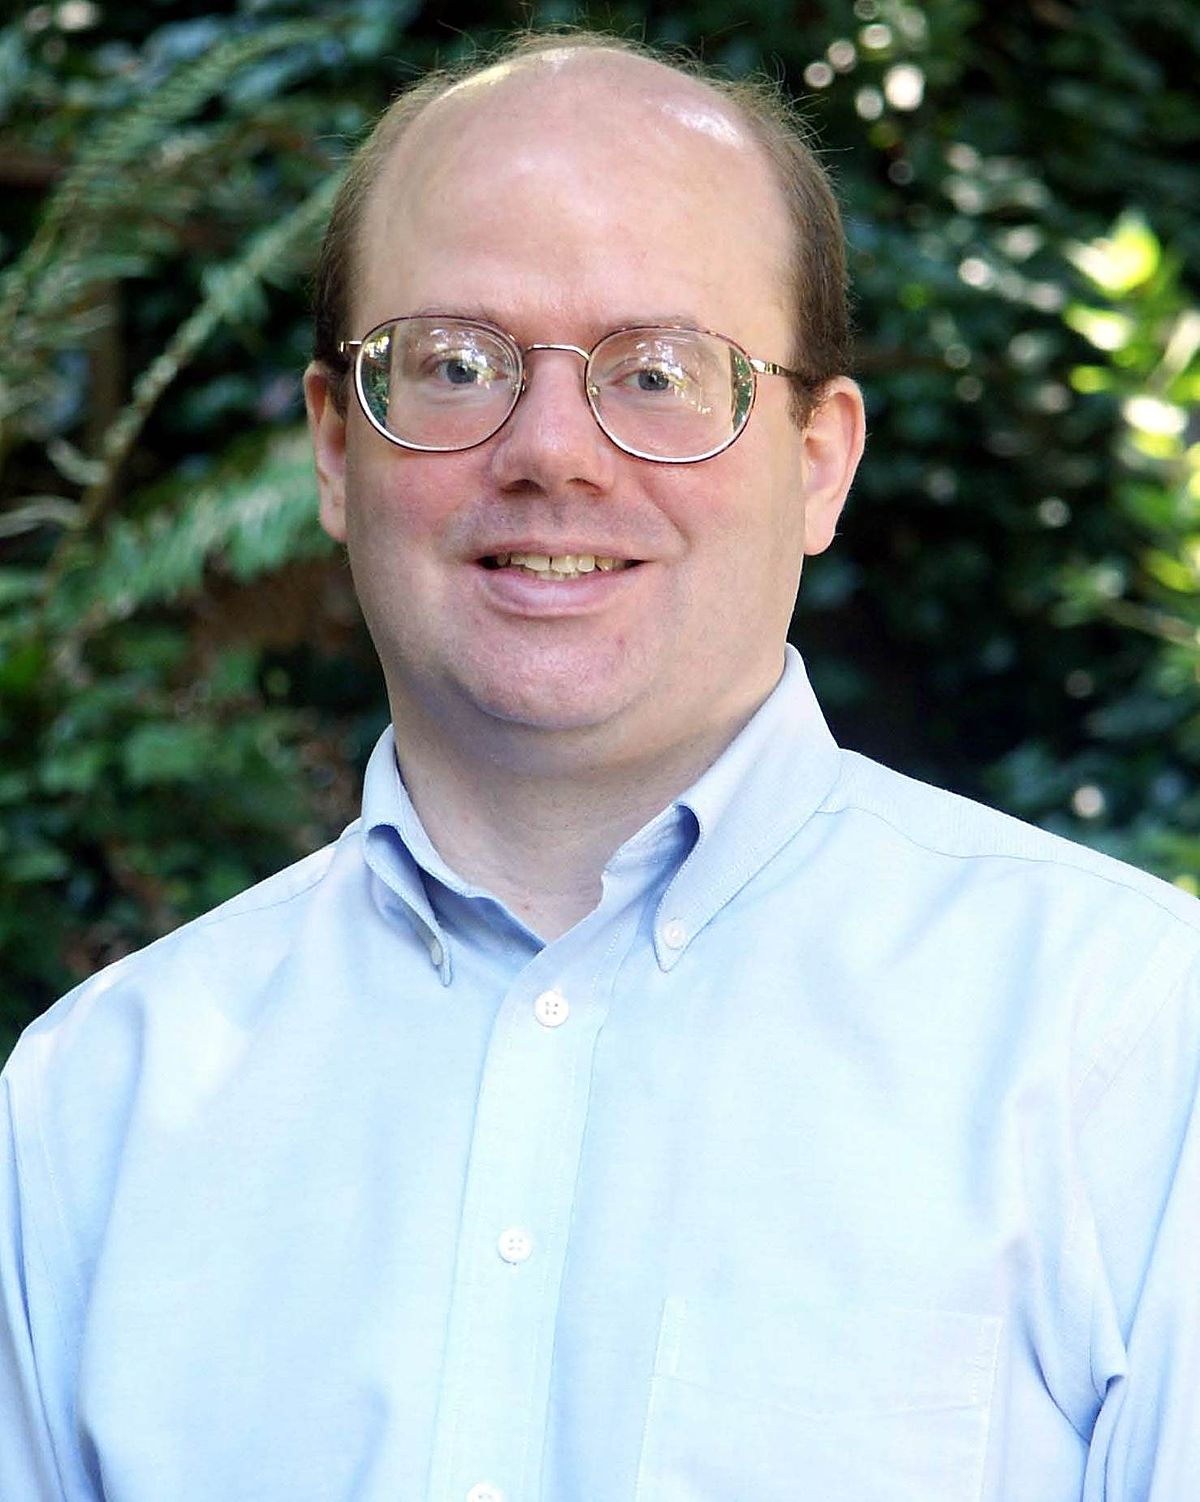 Ларри Сэнгер, бывший главный редактор Nupedia.